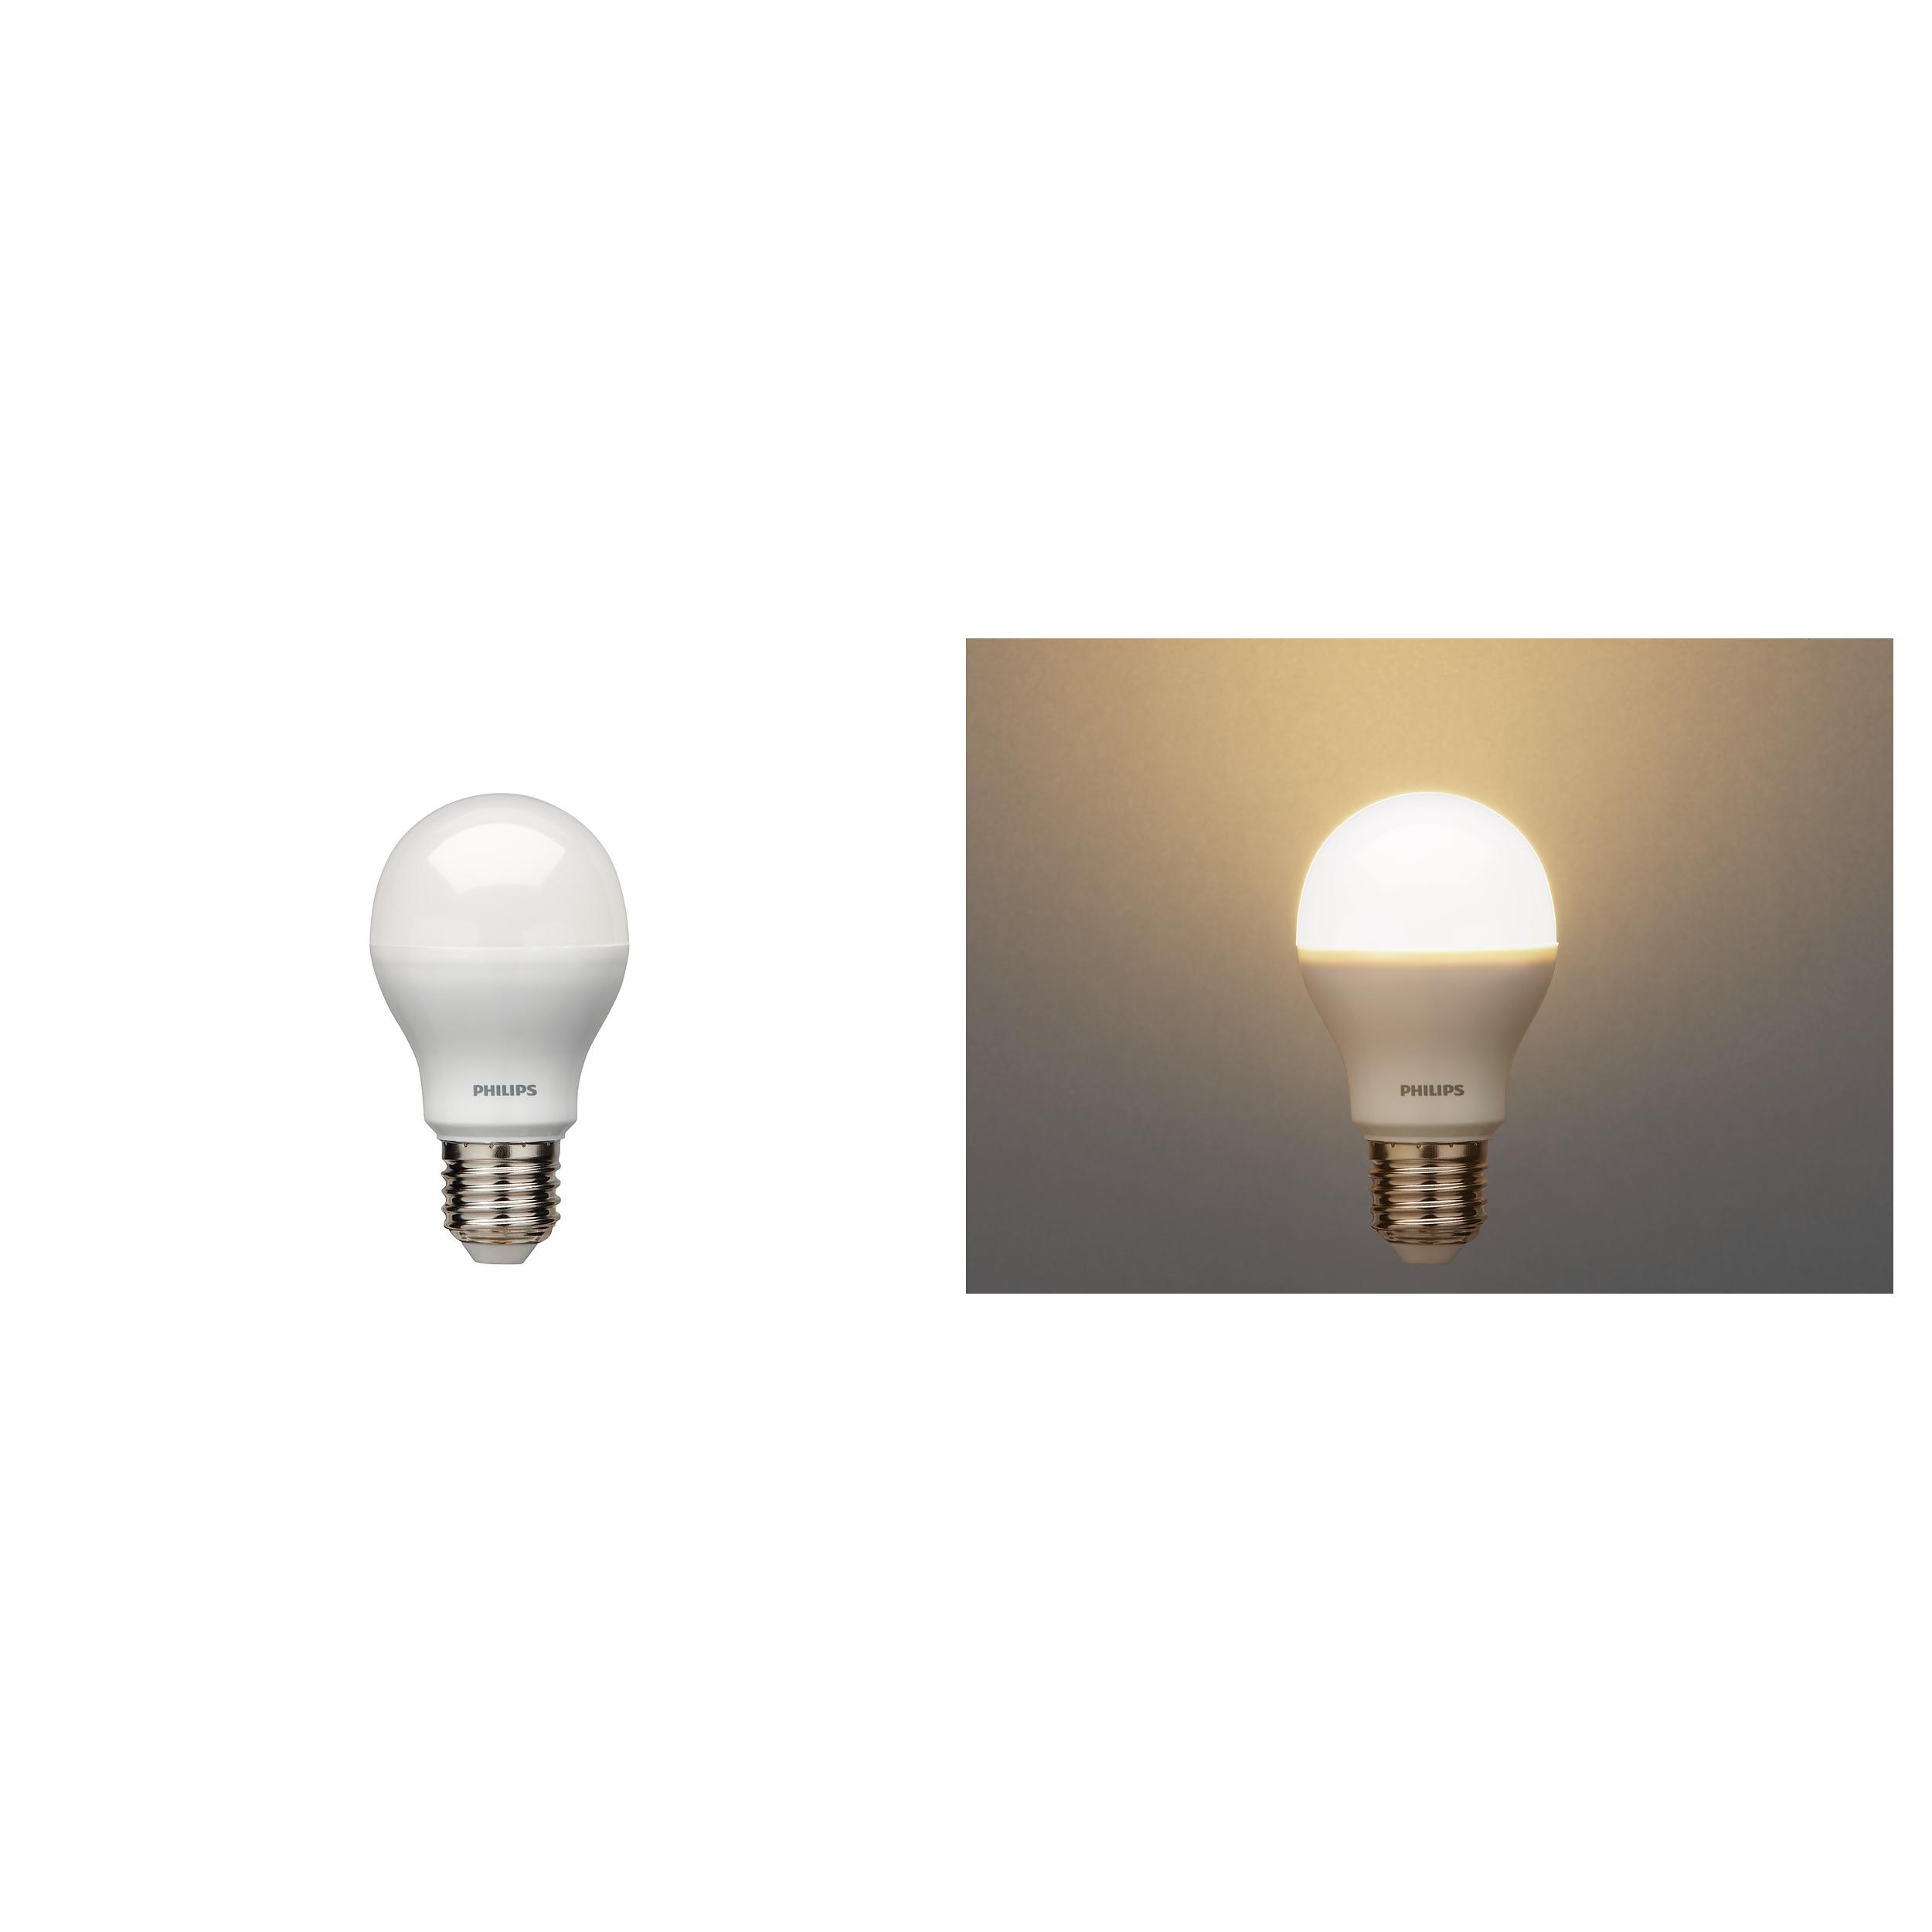 philips led gl hbirne licht standartform schraubsockel e27 8w 48w energiearm ebay. Black Bedroom Furniture Sets. Home Design Ideas